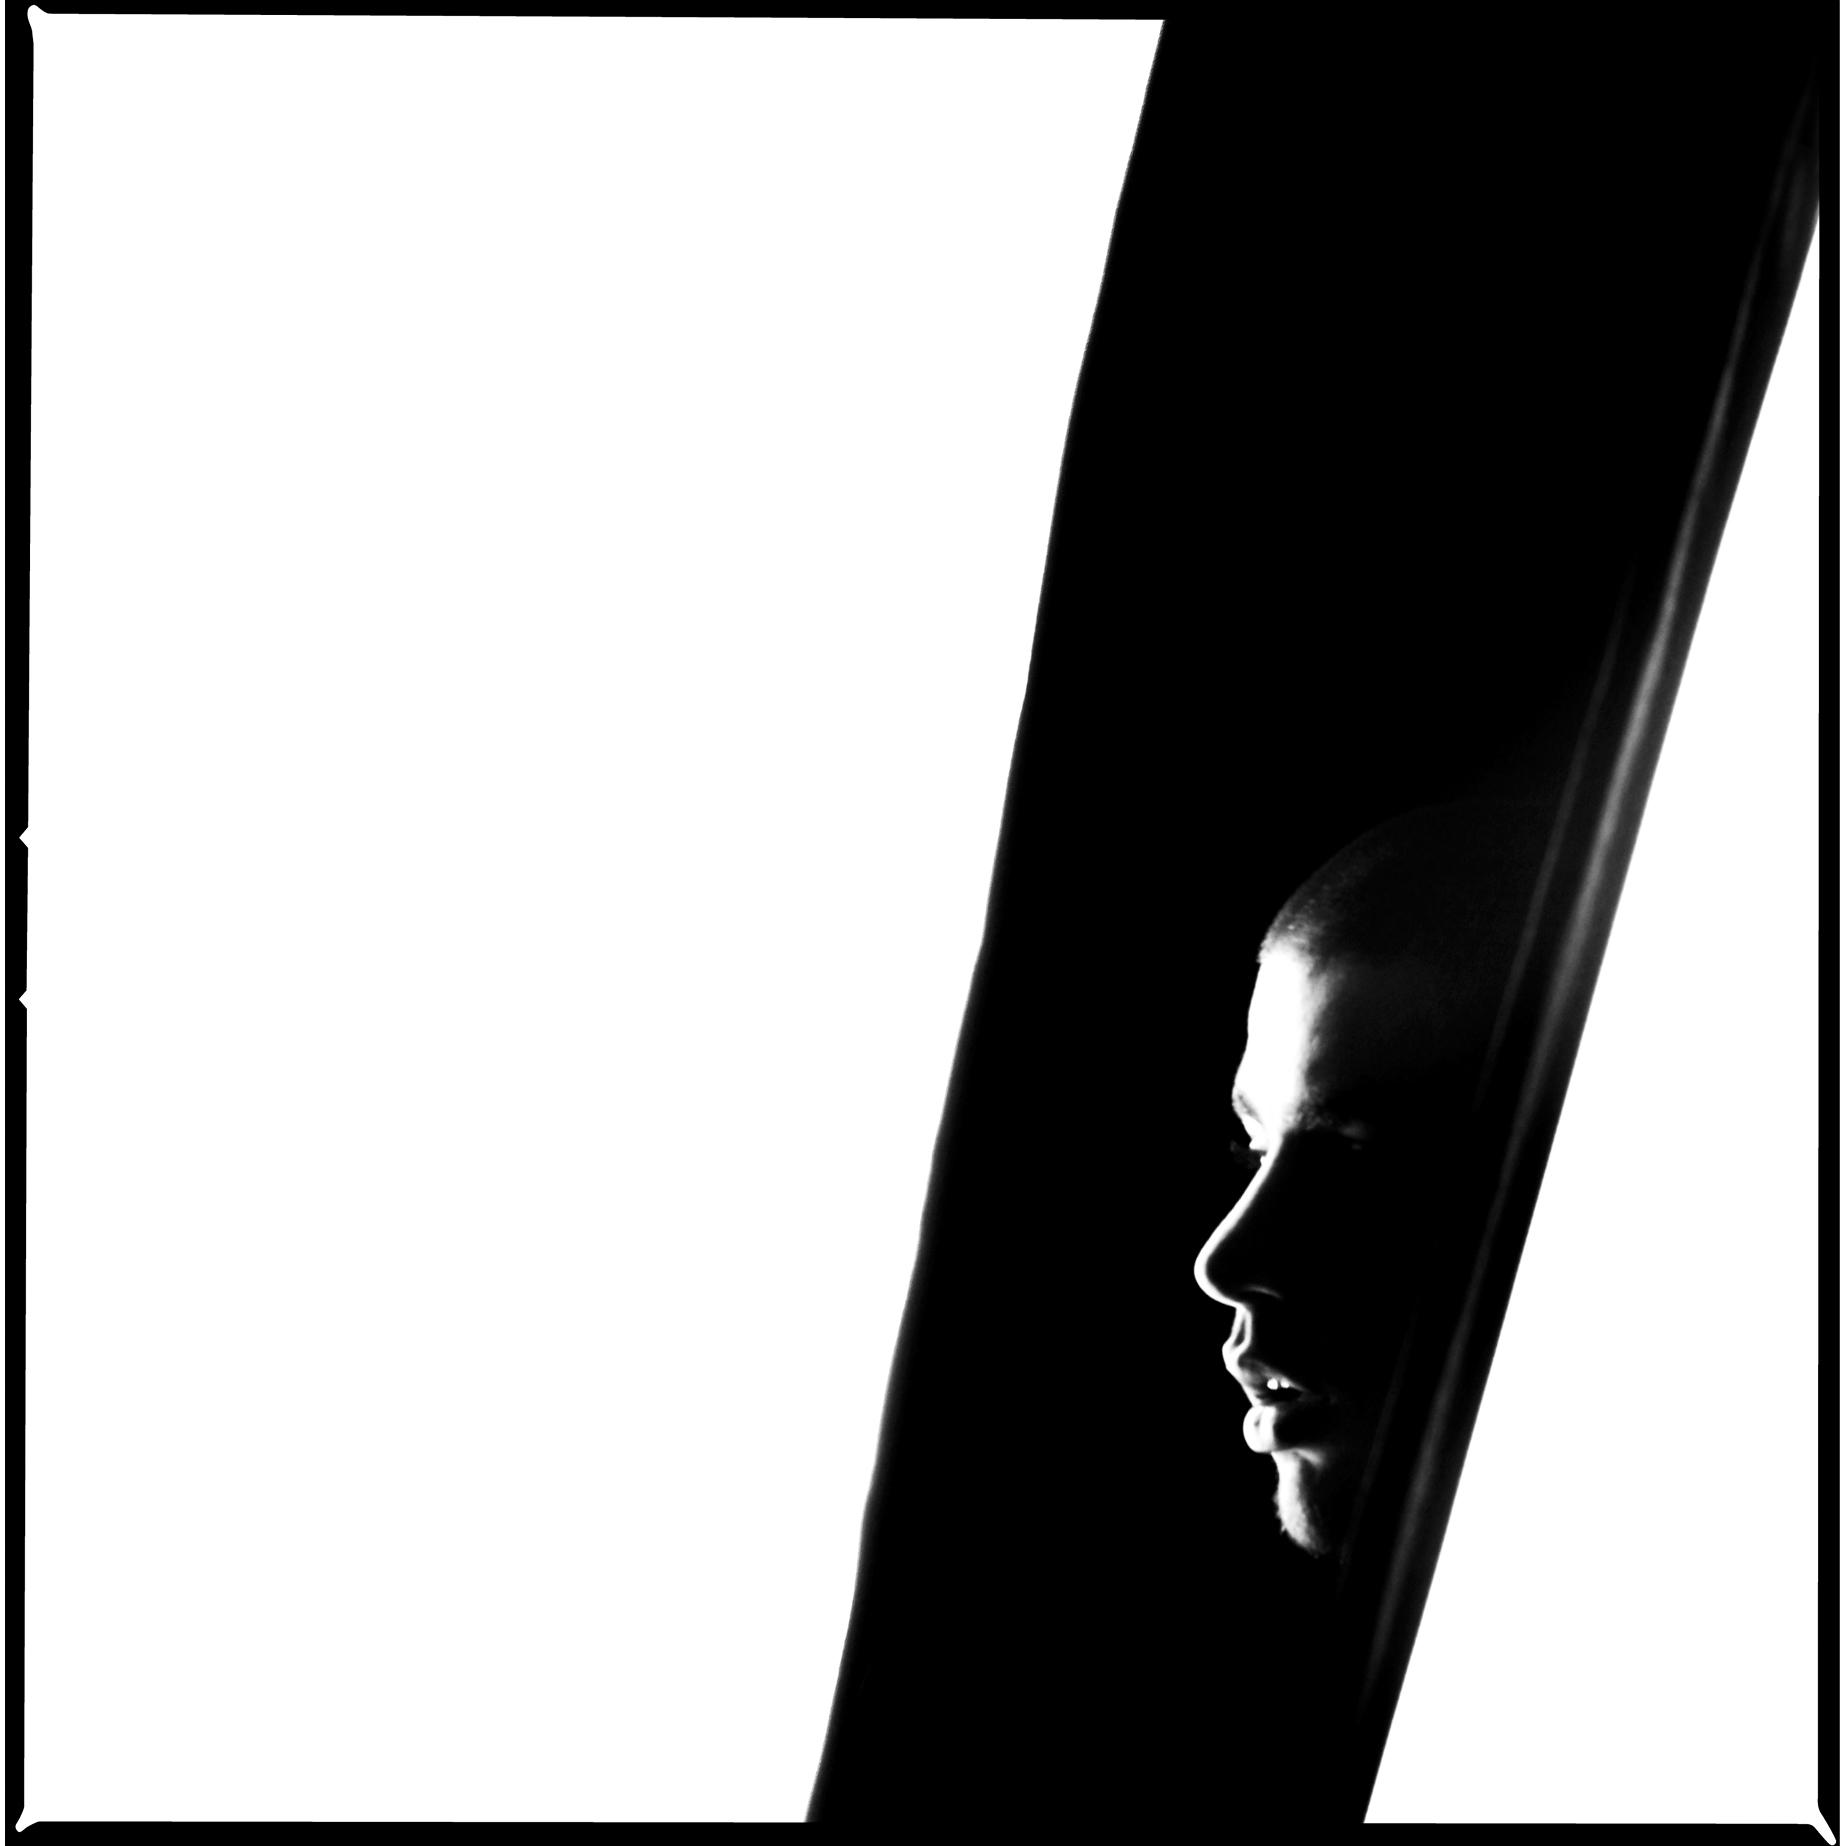 Oscar_Arribas_Portrait_photography_retrato_editorial_project_fotografia_studio_34.jpg